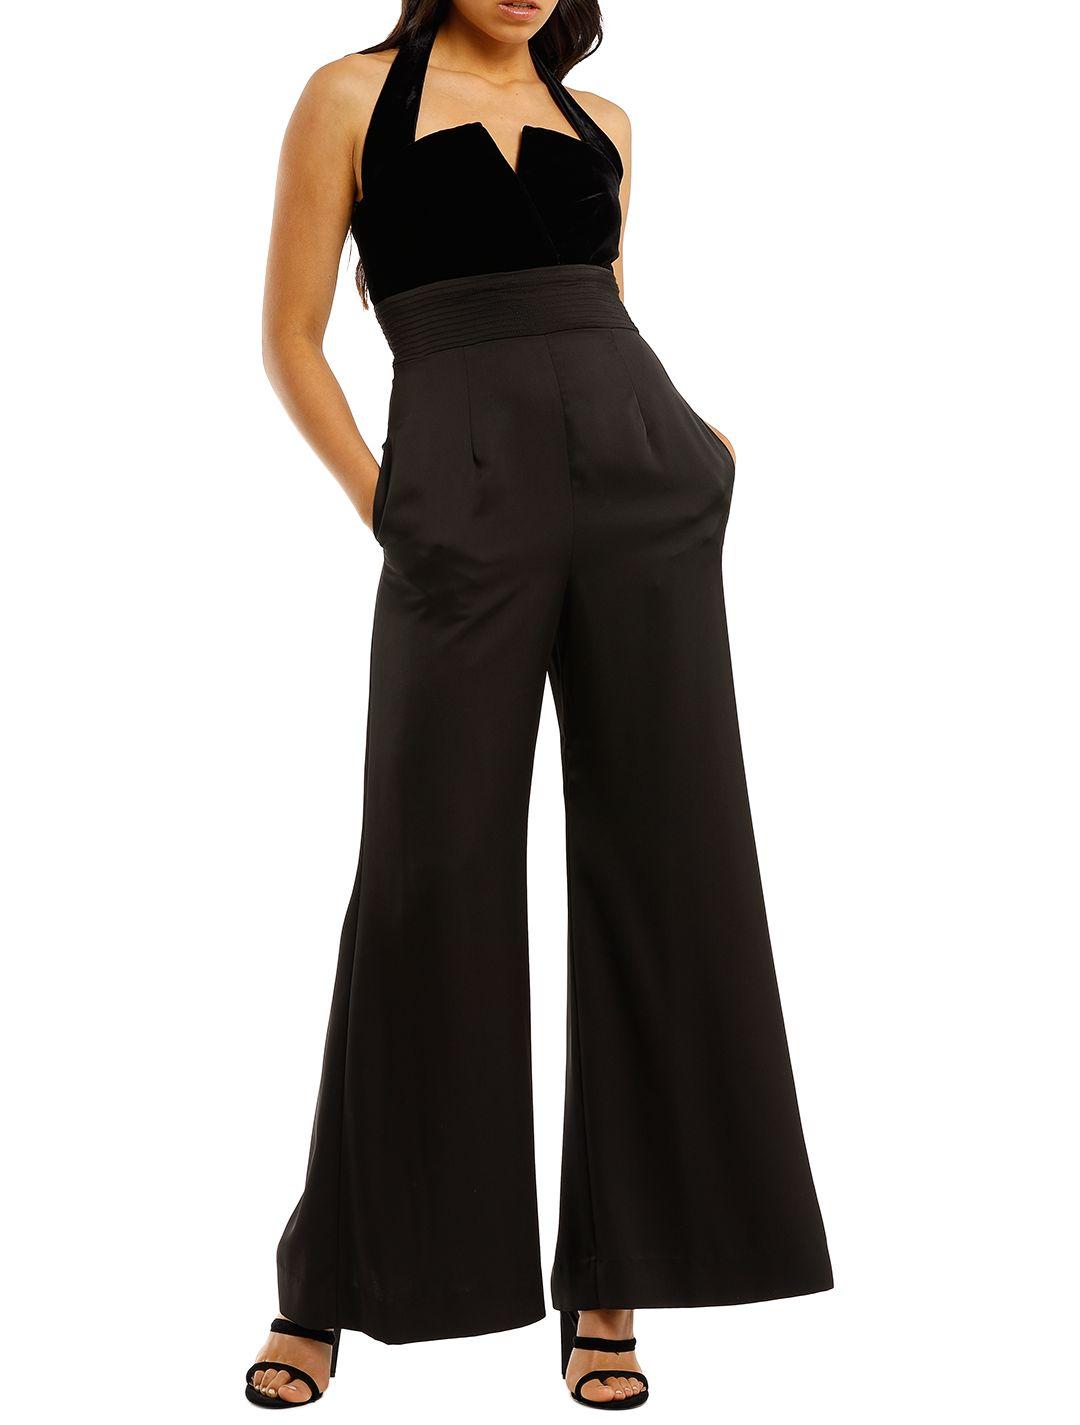 Jill-Jill-Stuart-Black-Velvet-Jumpsuit-Front